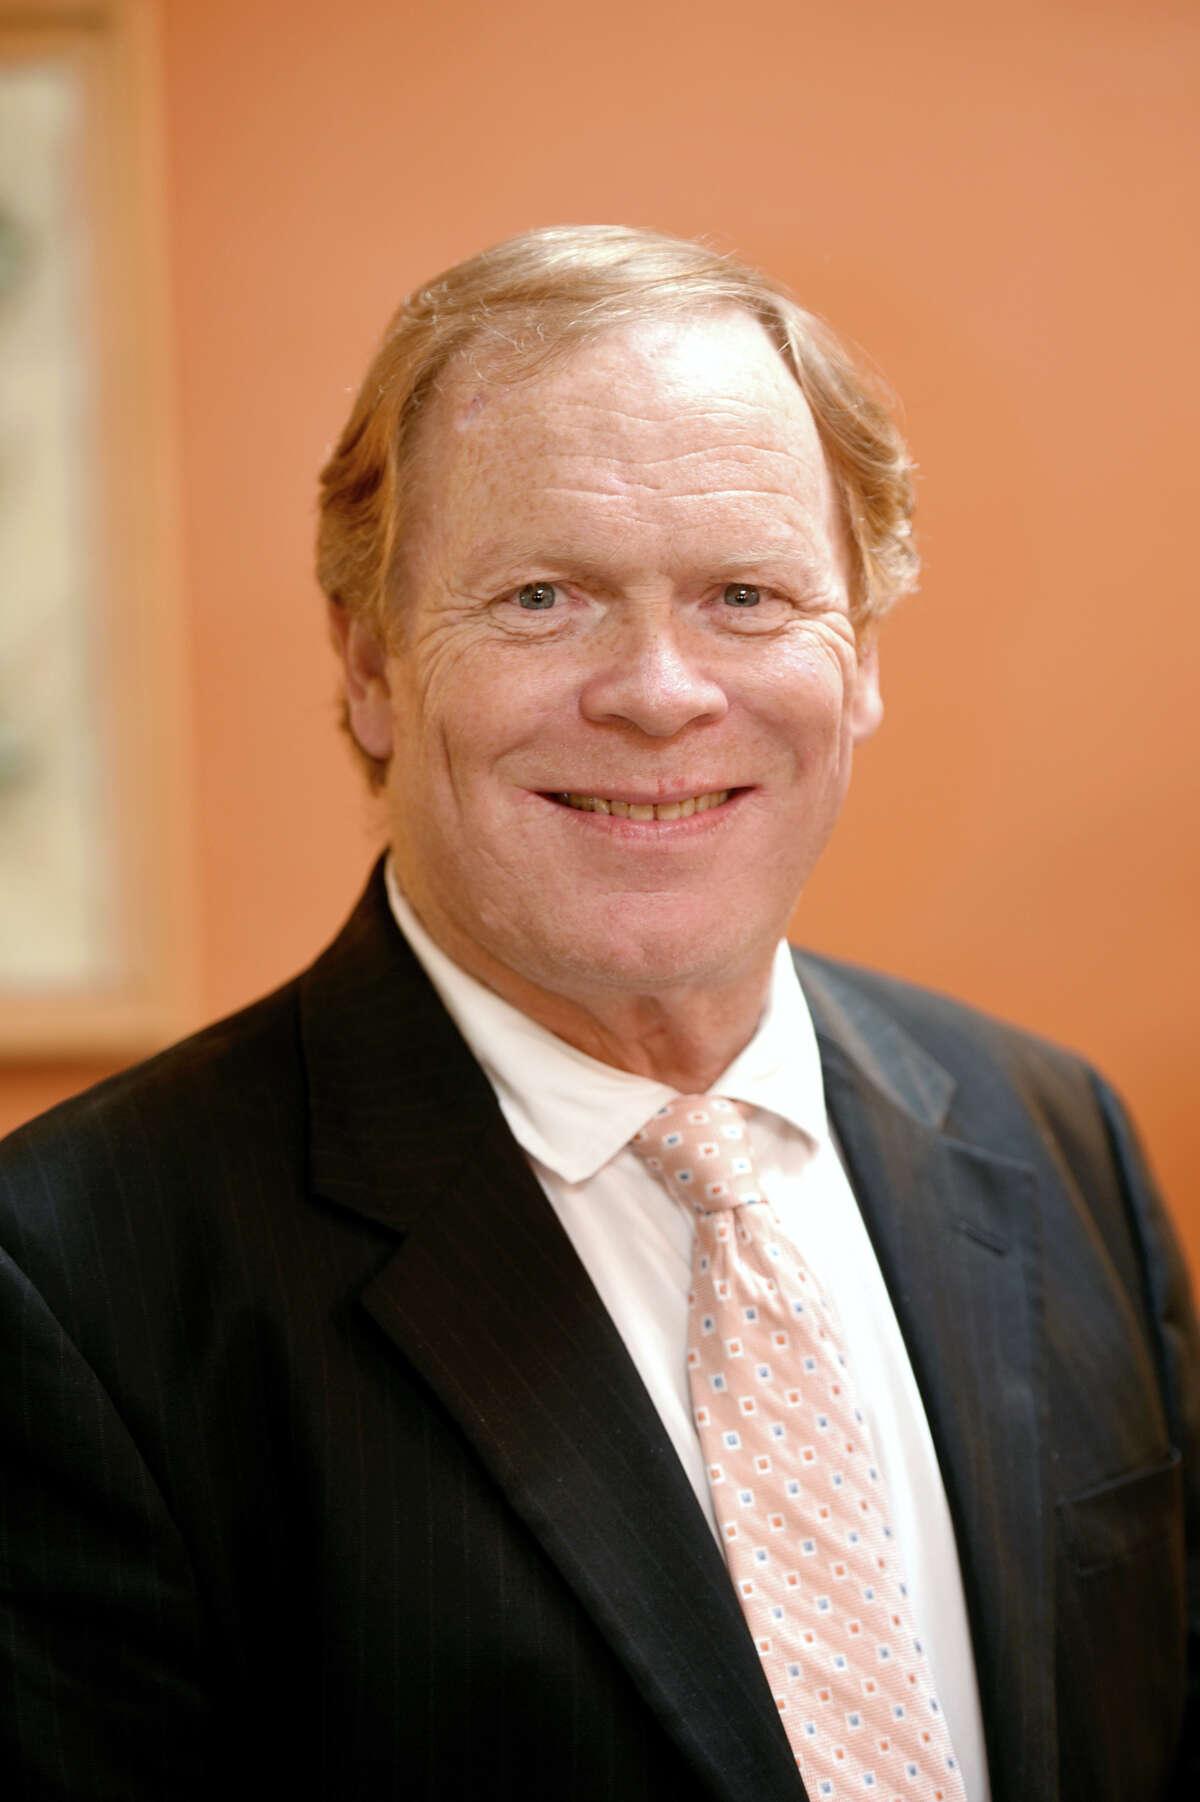 Jeff Robnett, candidate for 441st Judicial District Court, photographed Nov. 28, 2017. James Durbin/Reporter-Telegram